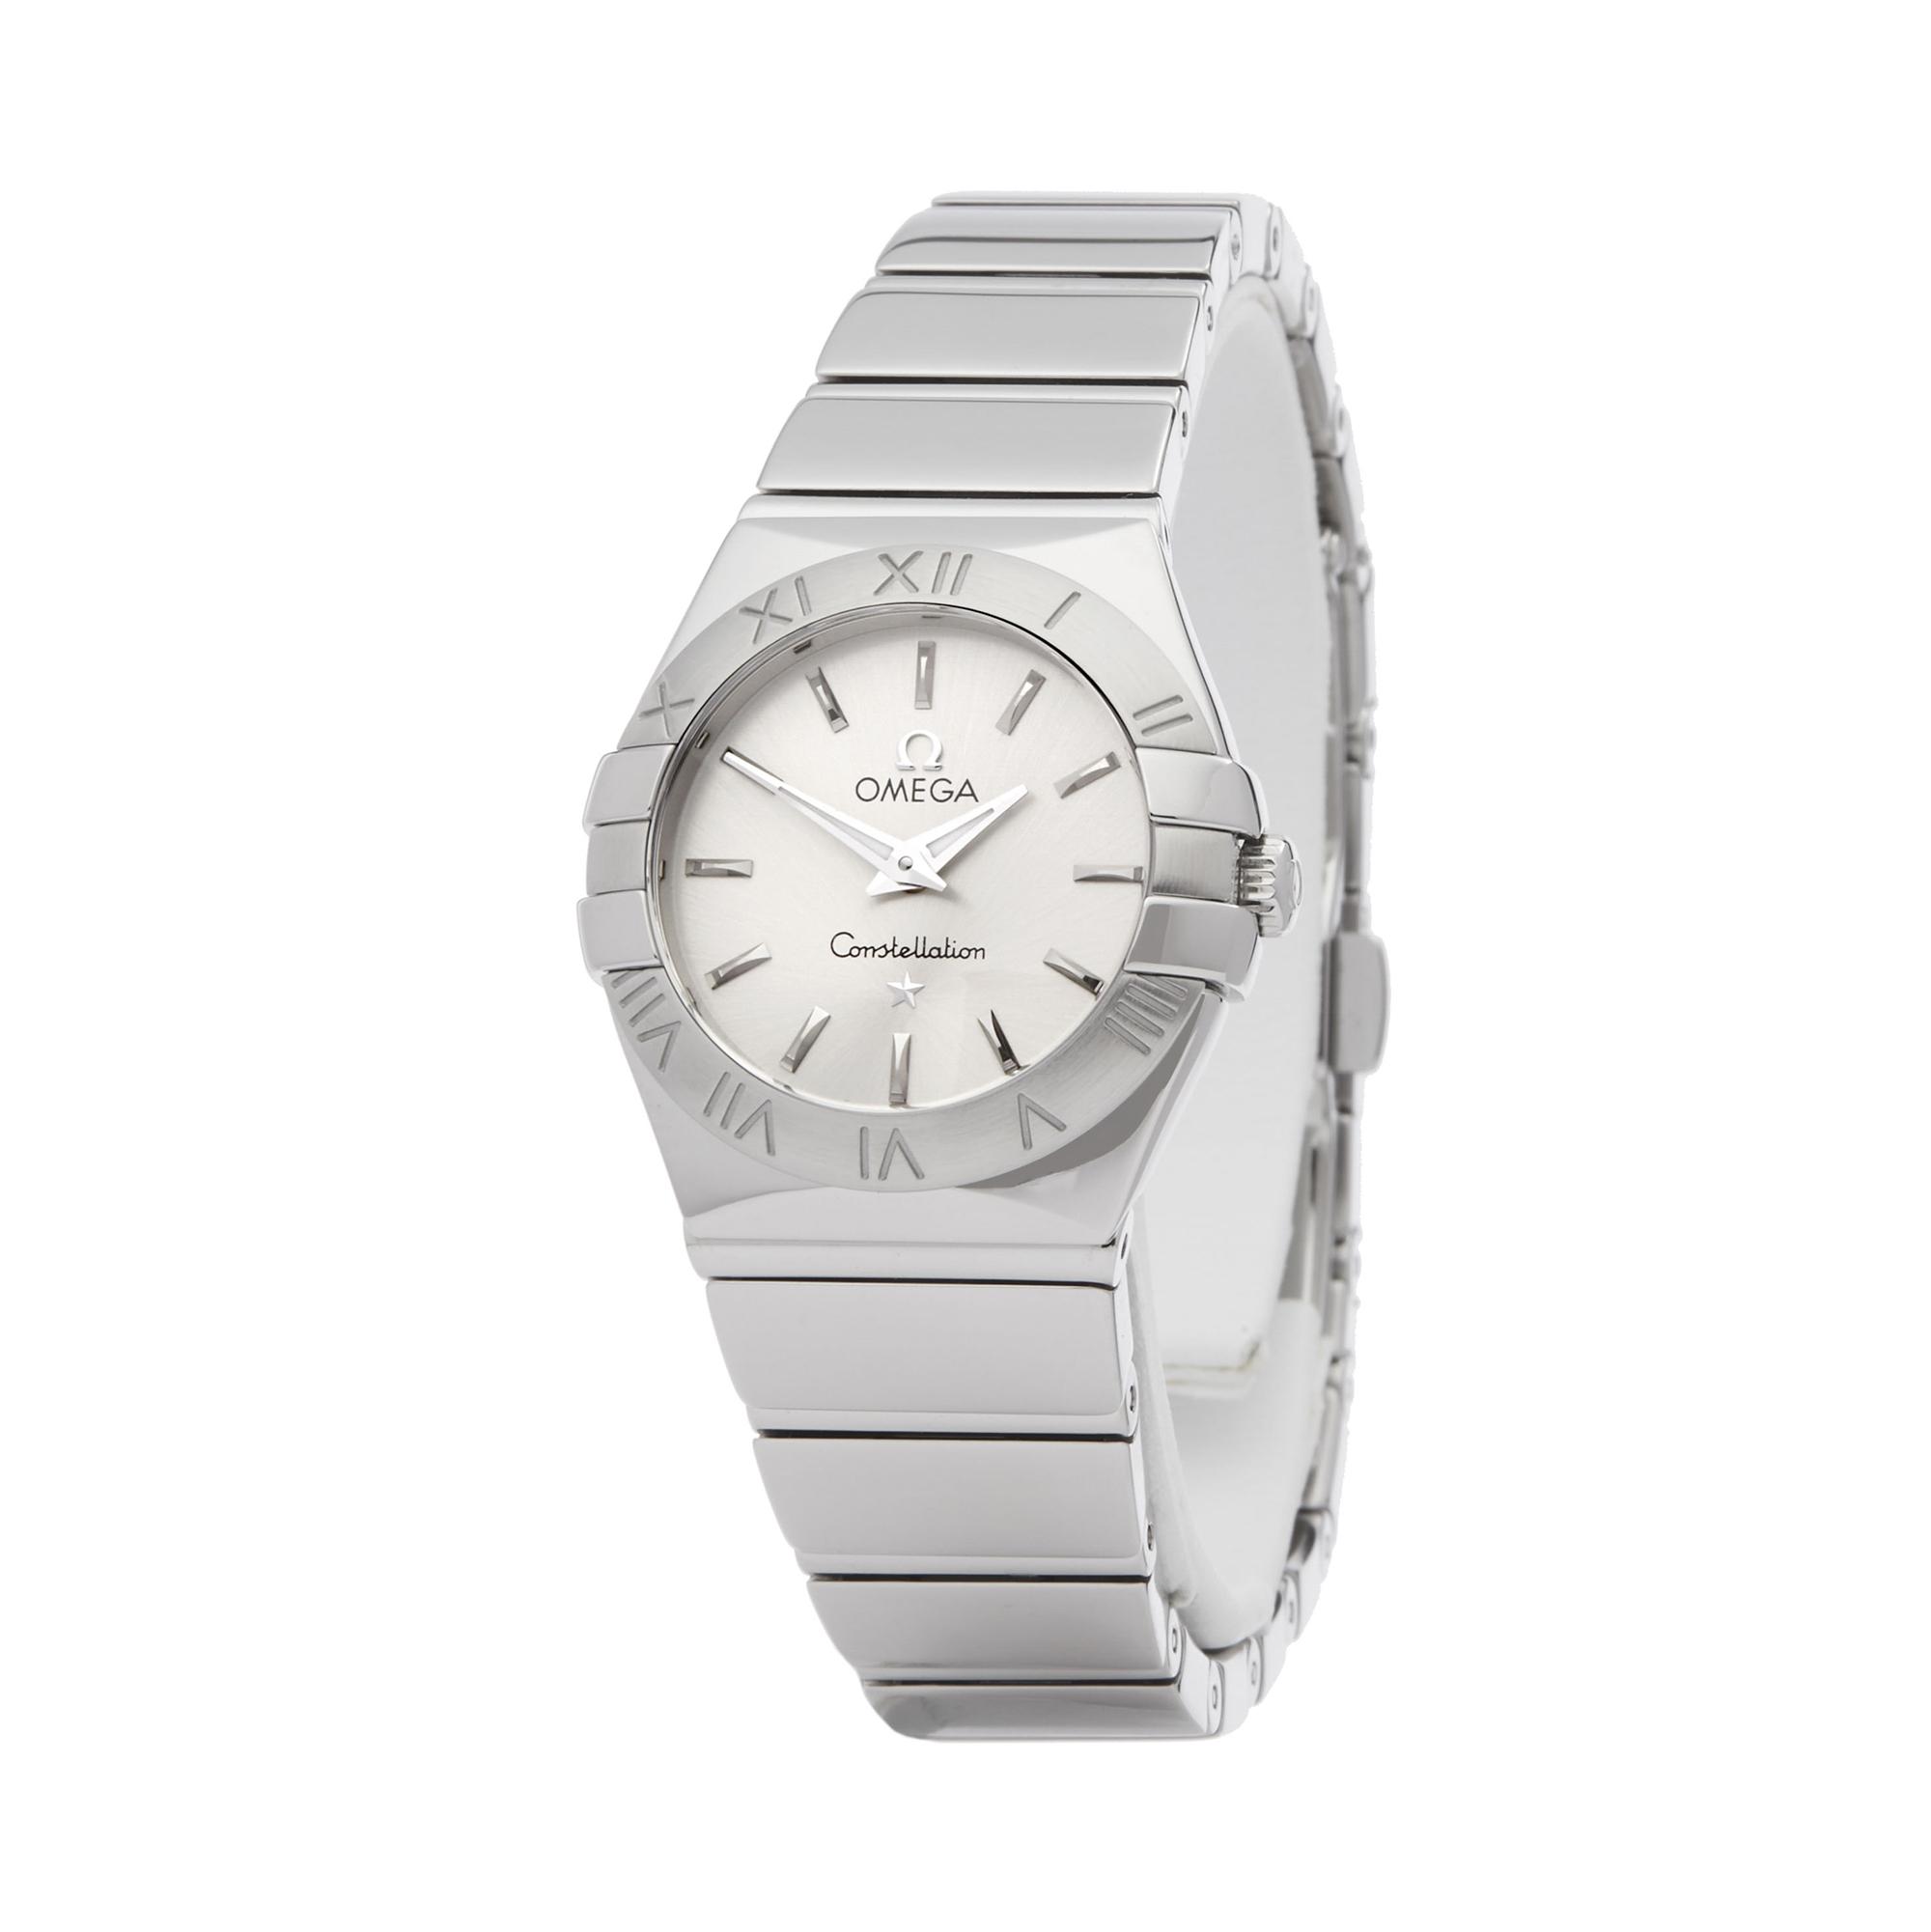 Omega Constellation 123.10.24.60.02.00 Ladies Stainless Steel Watch